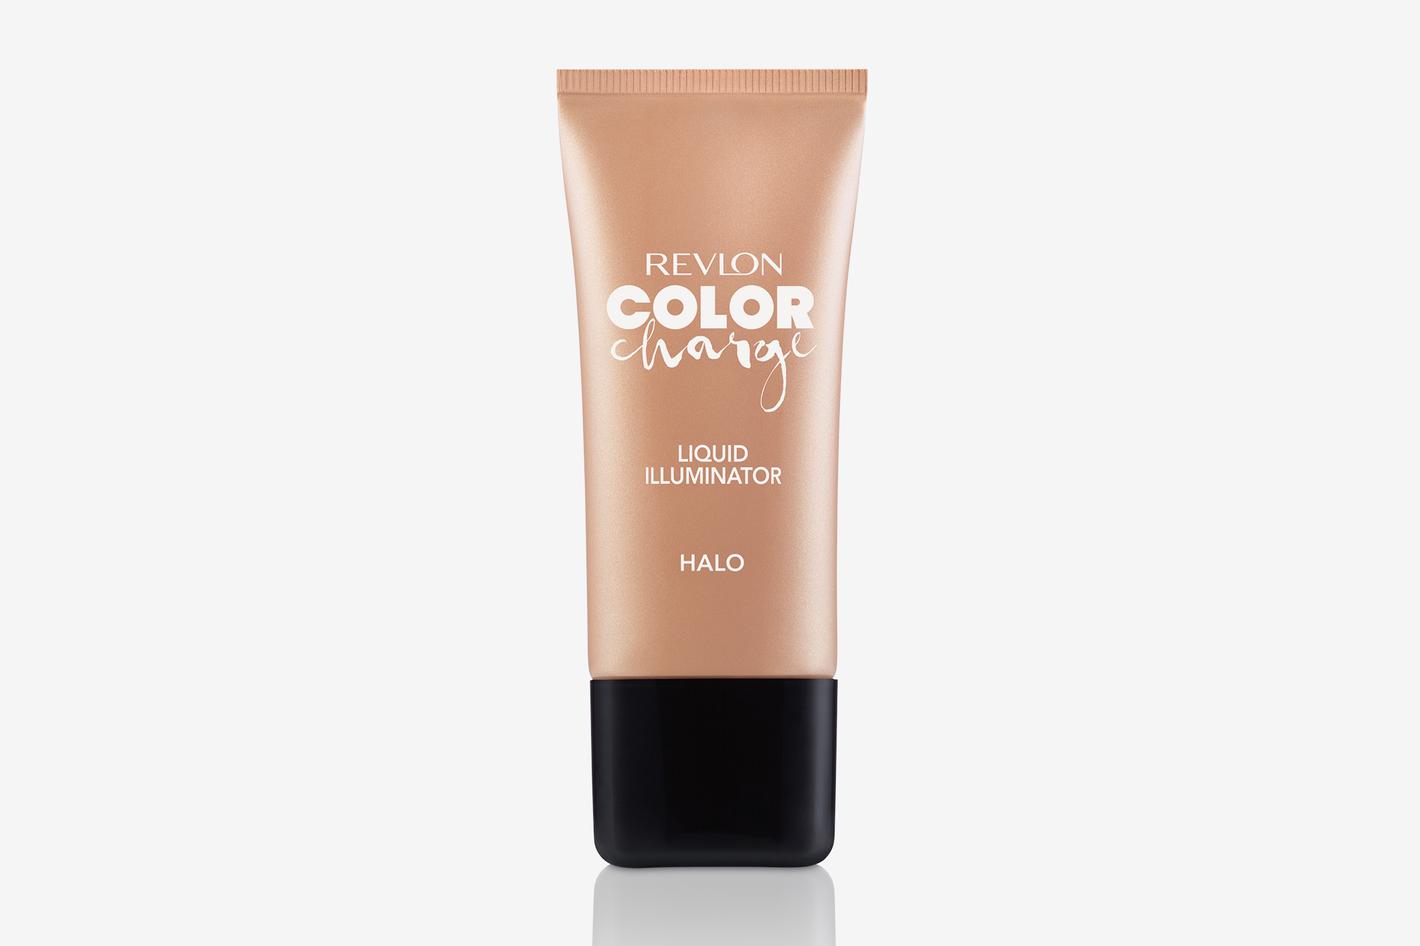 Revlon Liquid Illuminator in Halo